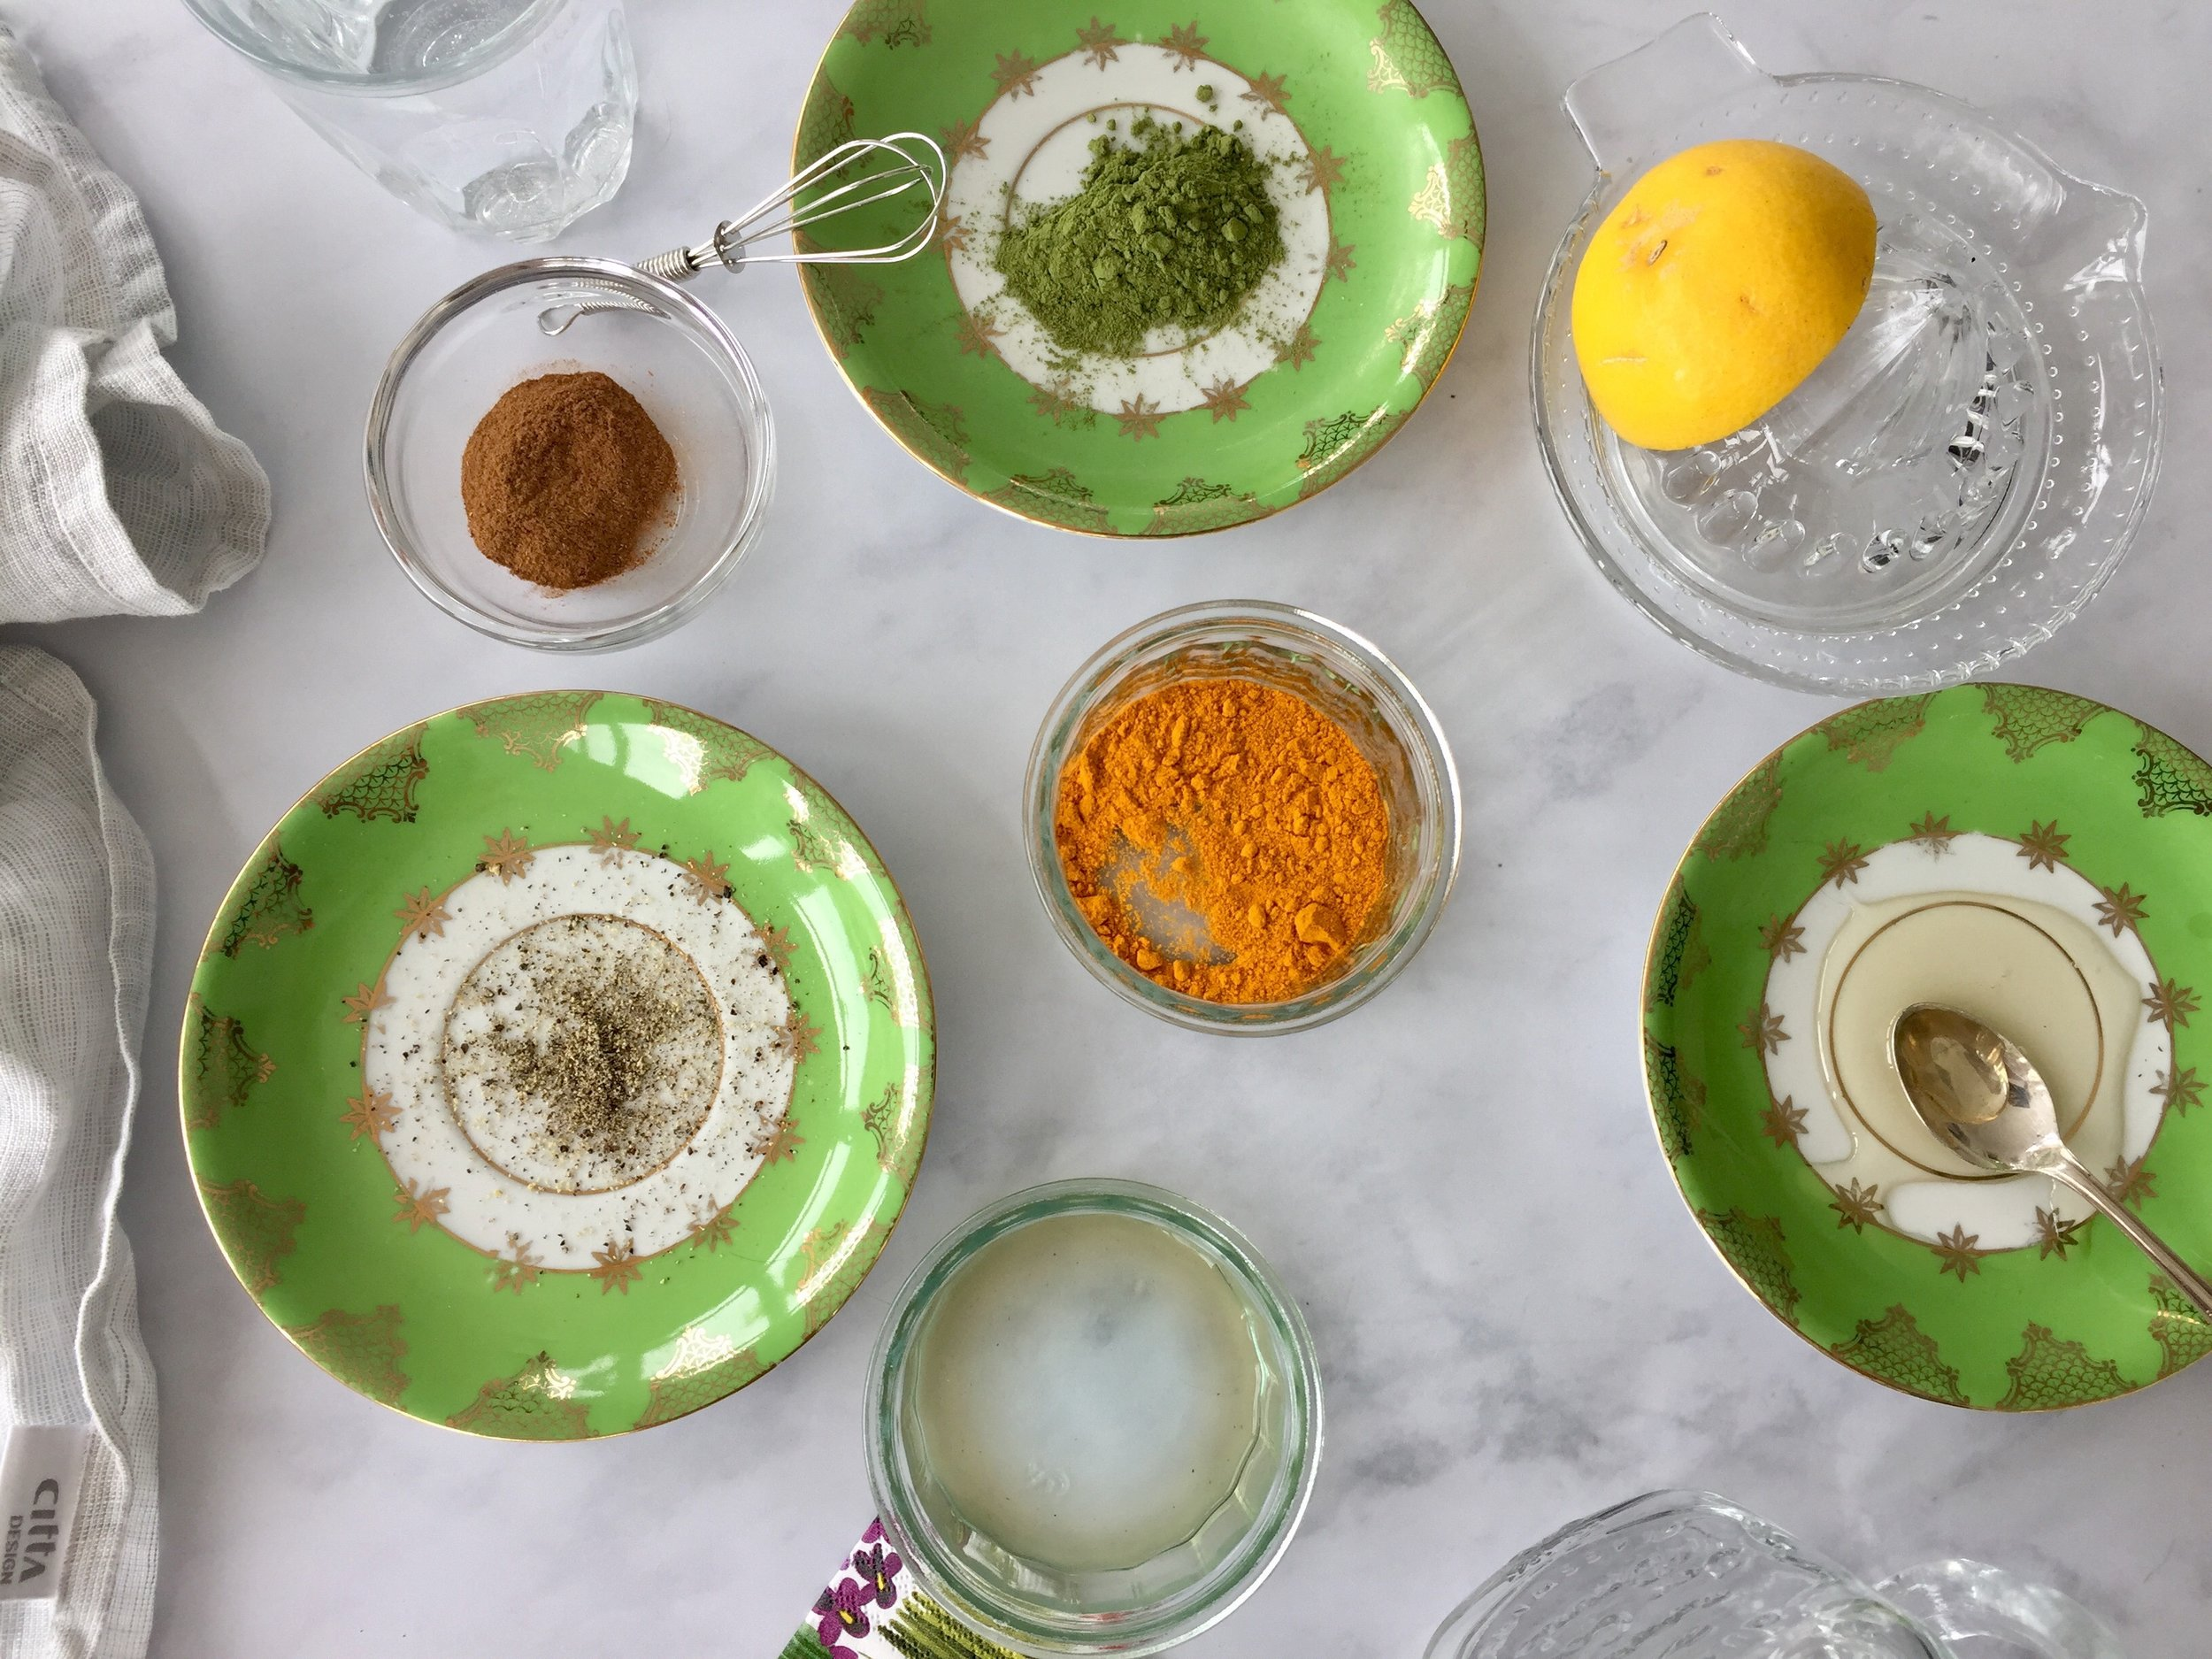 Ingredients for turmeric tea.